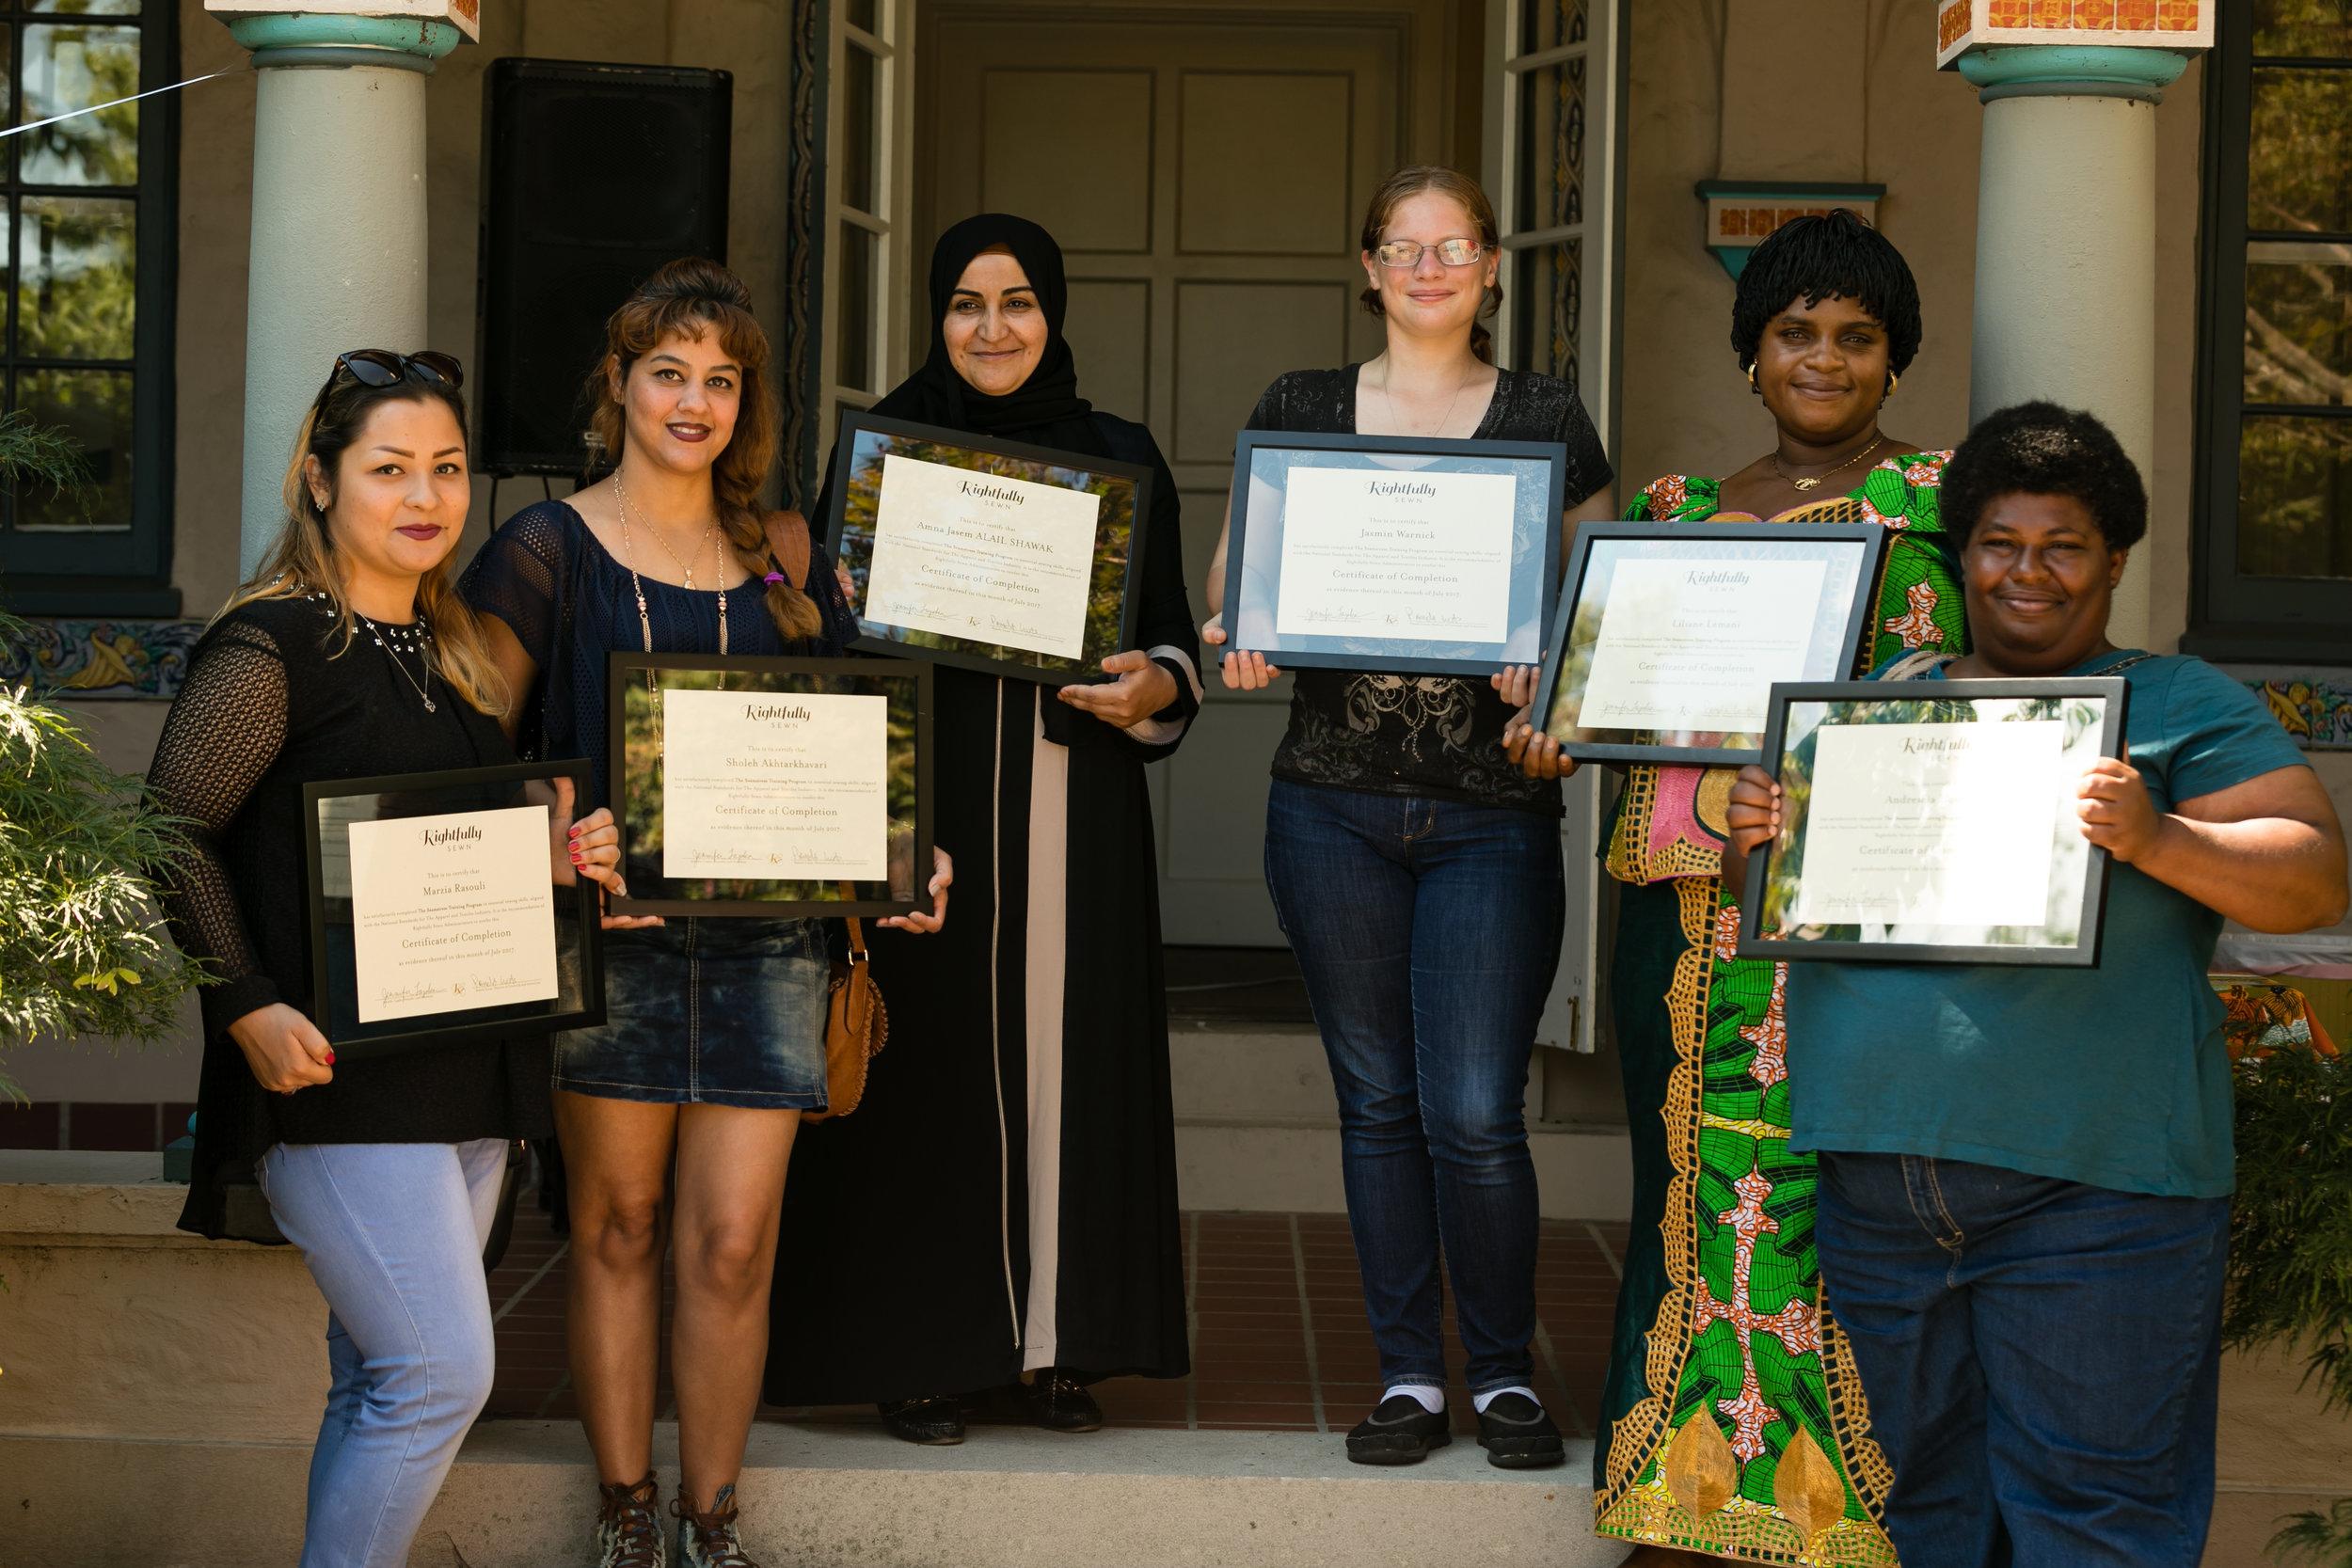 Left to right: Marzia, Sholeh, Amna, Jasmin, Liliane, and Andrescia (Photo by Jeff Evrard)